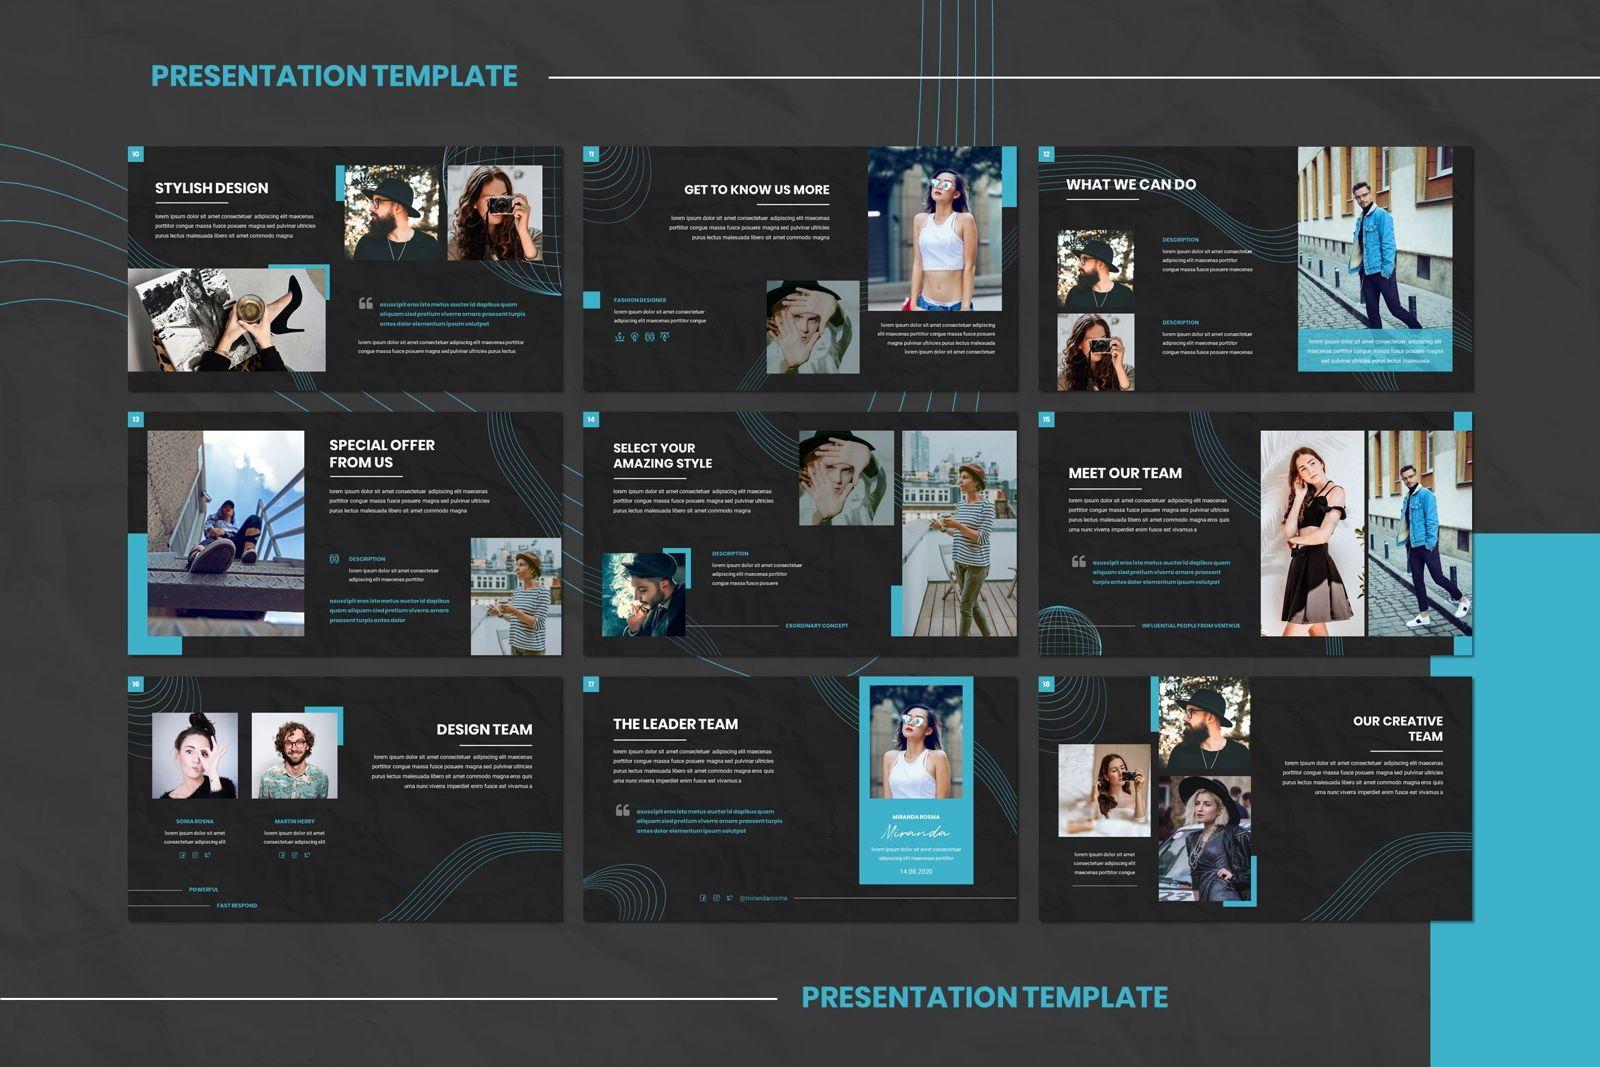 Ventikue - Google Slides Template, Slide 3, 07821, Presentation Templates — PoweredTemplate.com